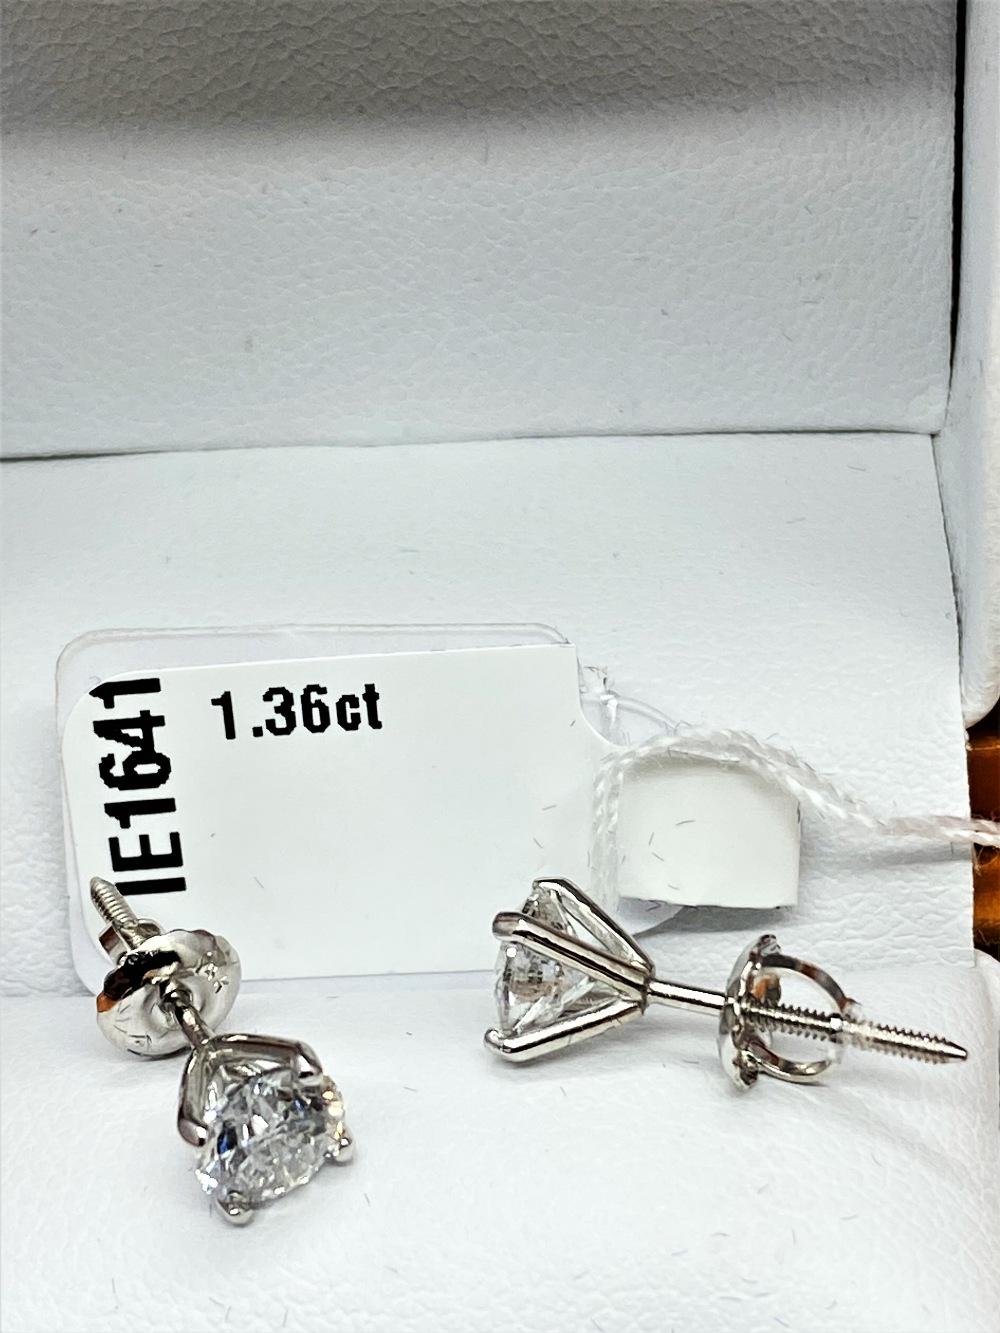 Pair of New 1.36 Carat Round Cut VS1/D Diamond Stud Earrings On 14K Hallmarked White Gold - Image 3 of 8